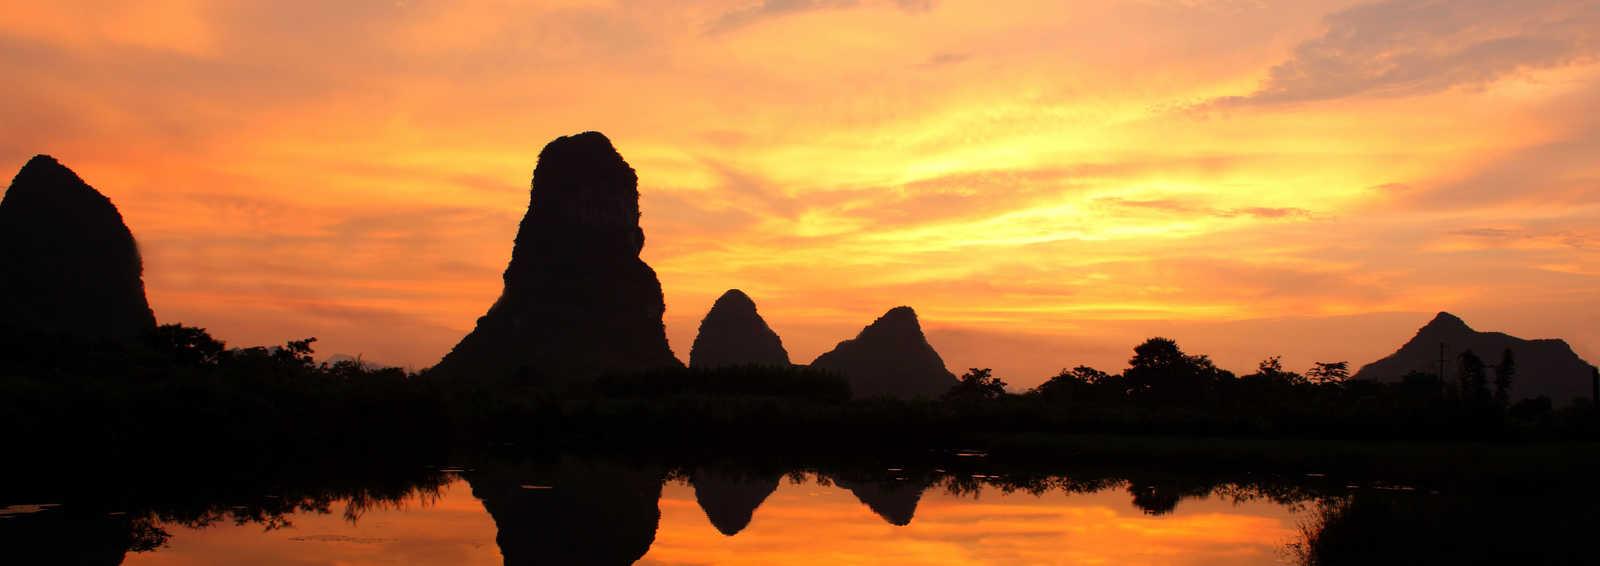 Sunset Guilin,China